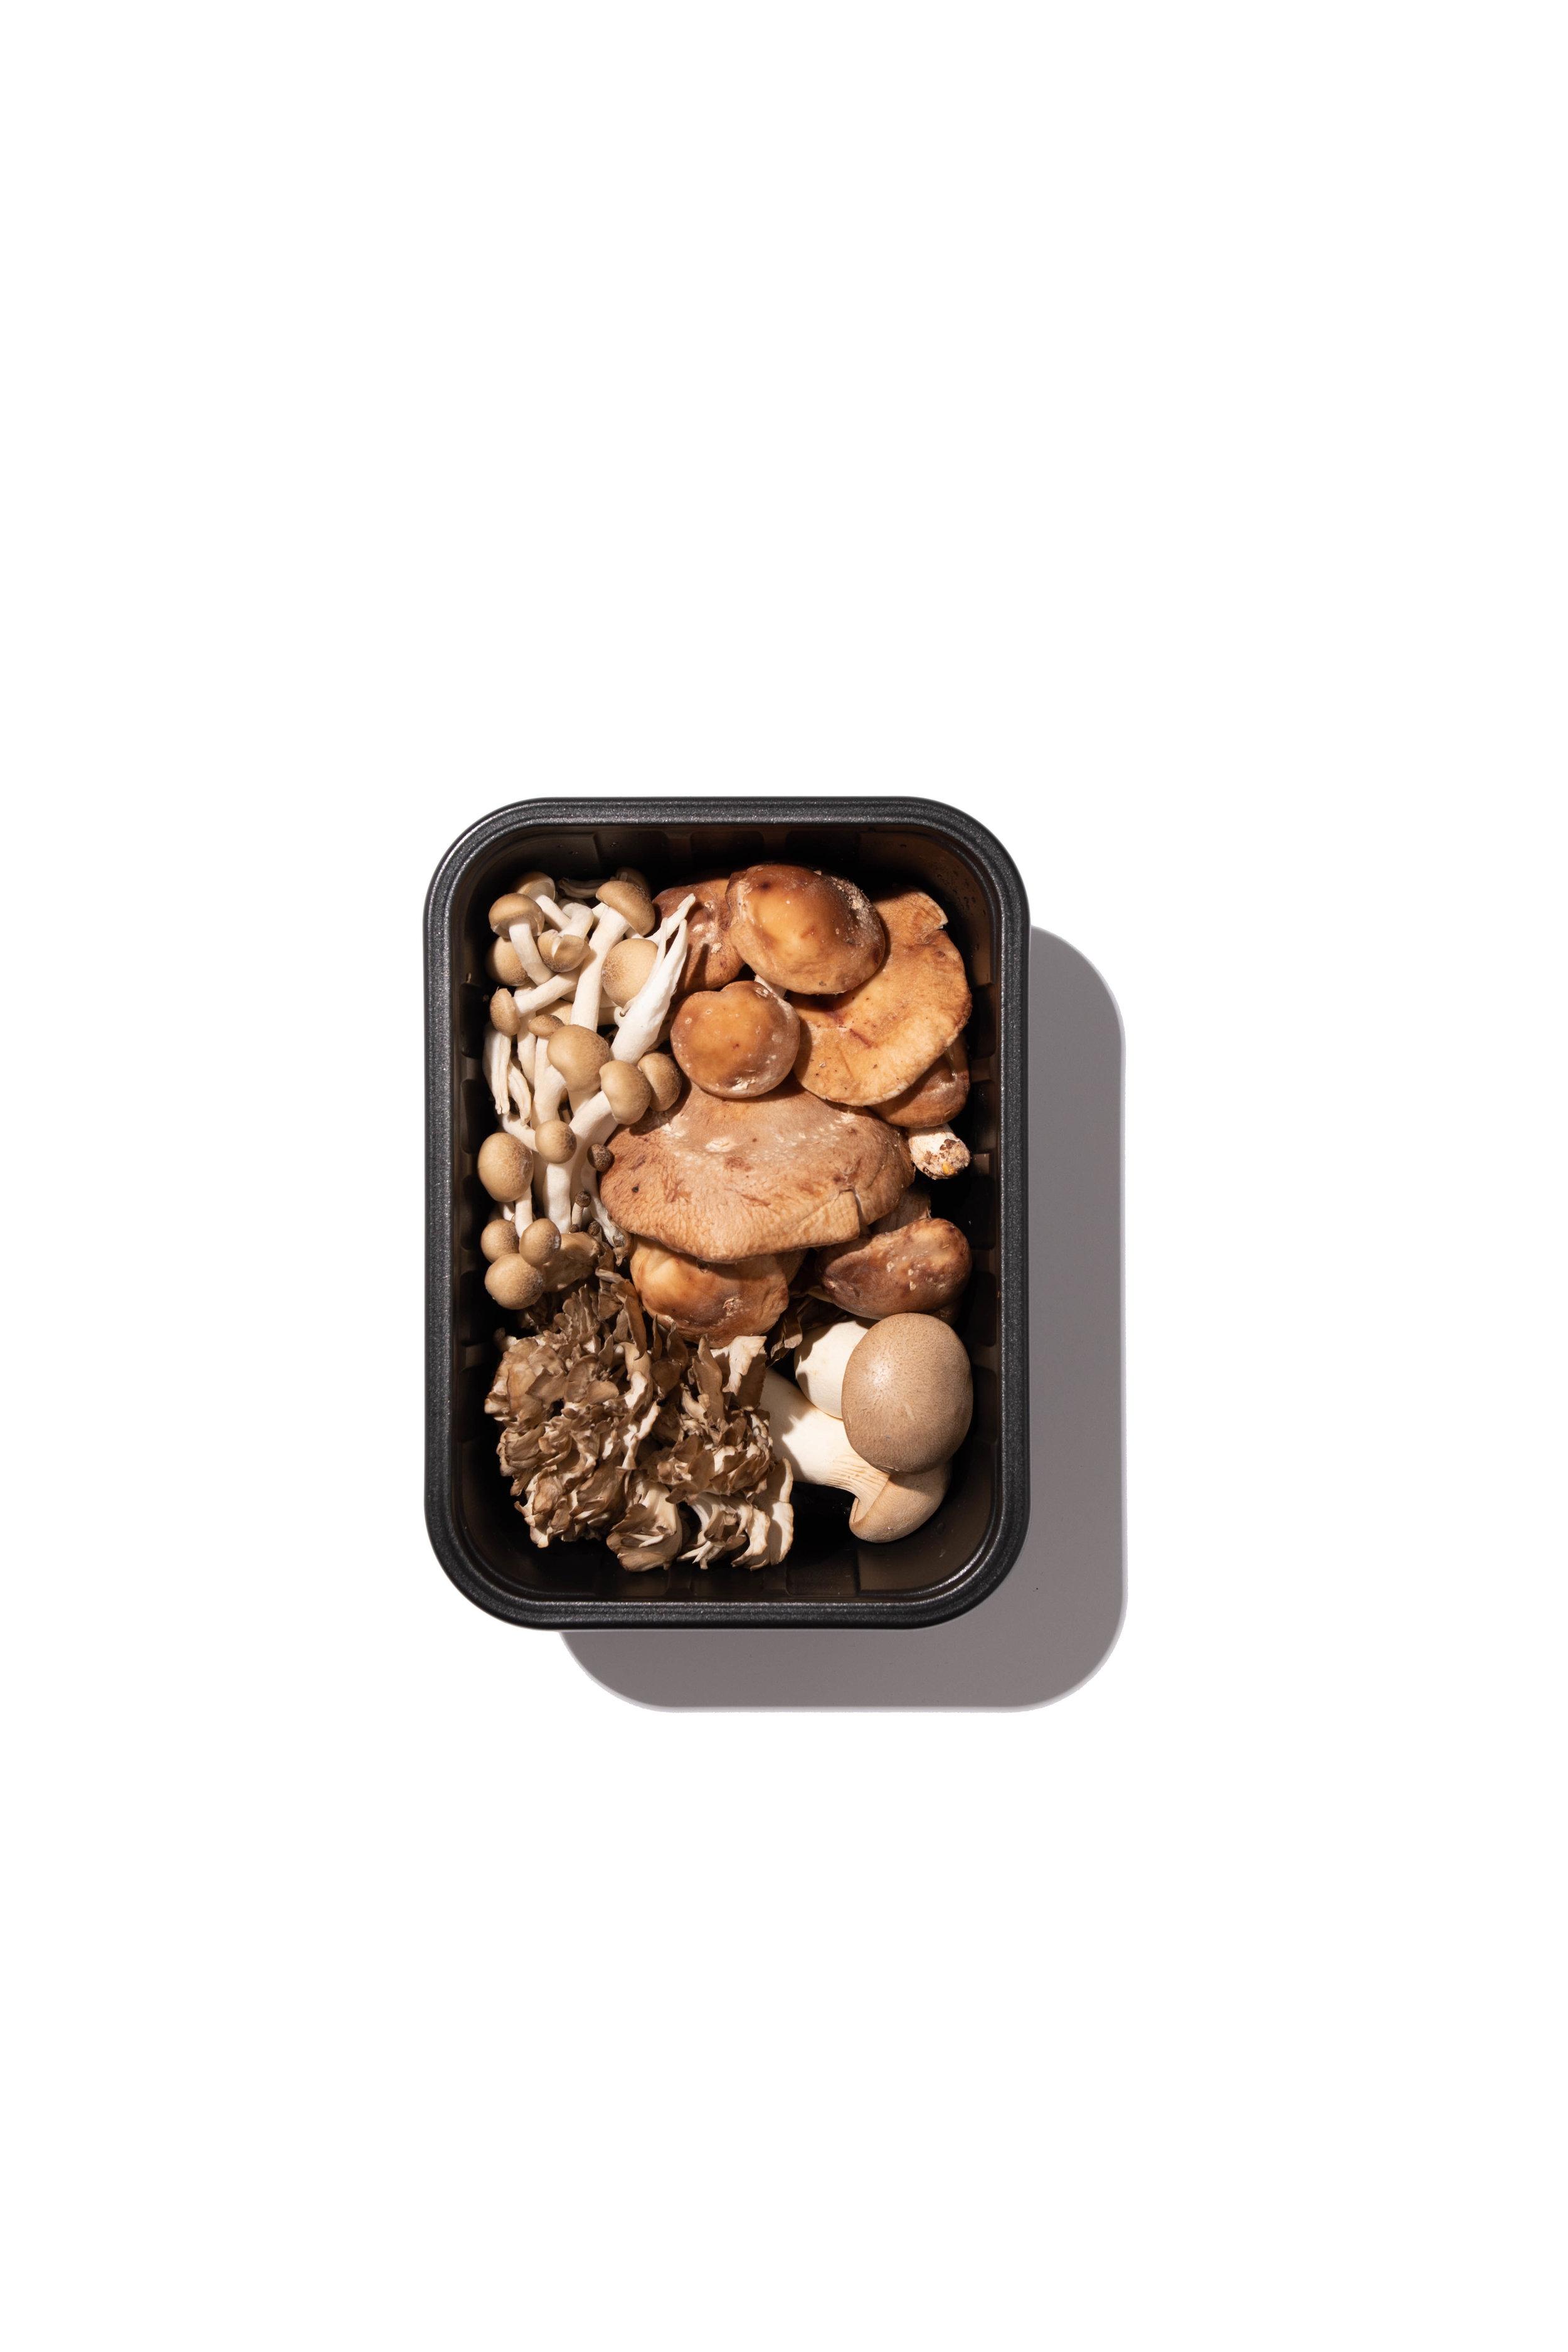 Mushrooms00033-Edit.jpg